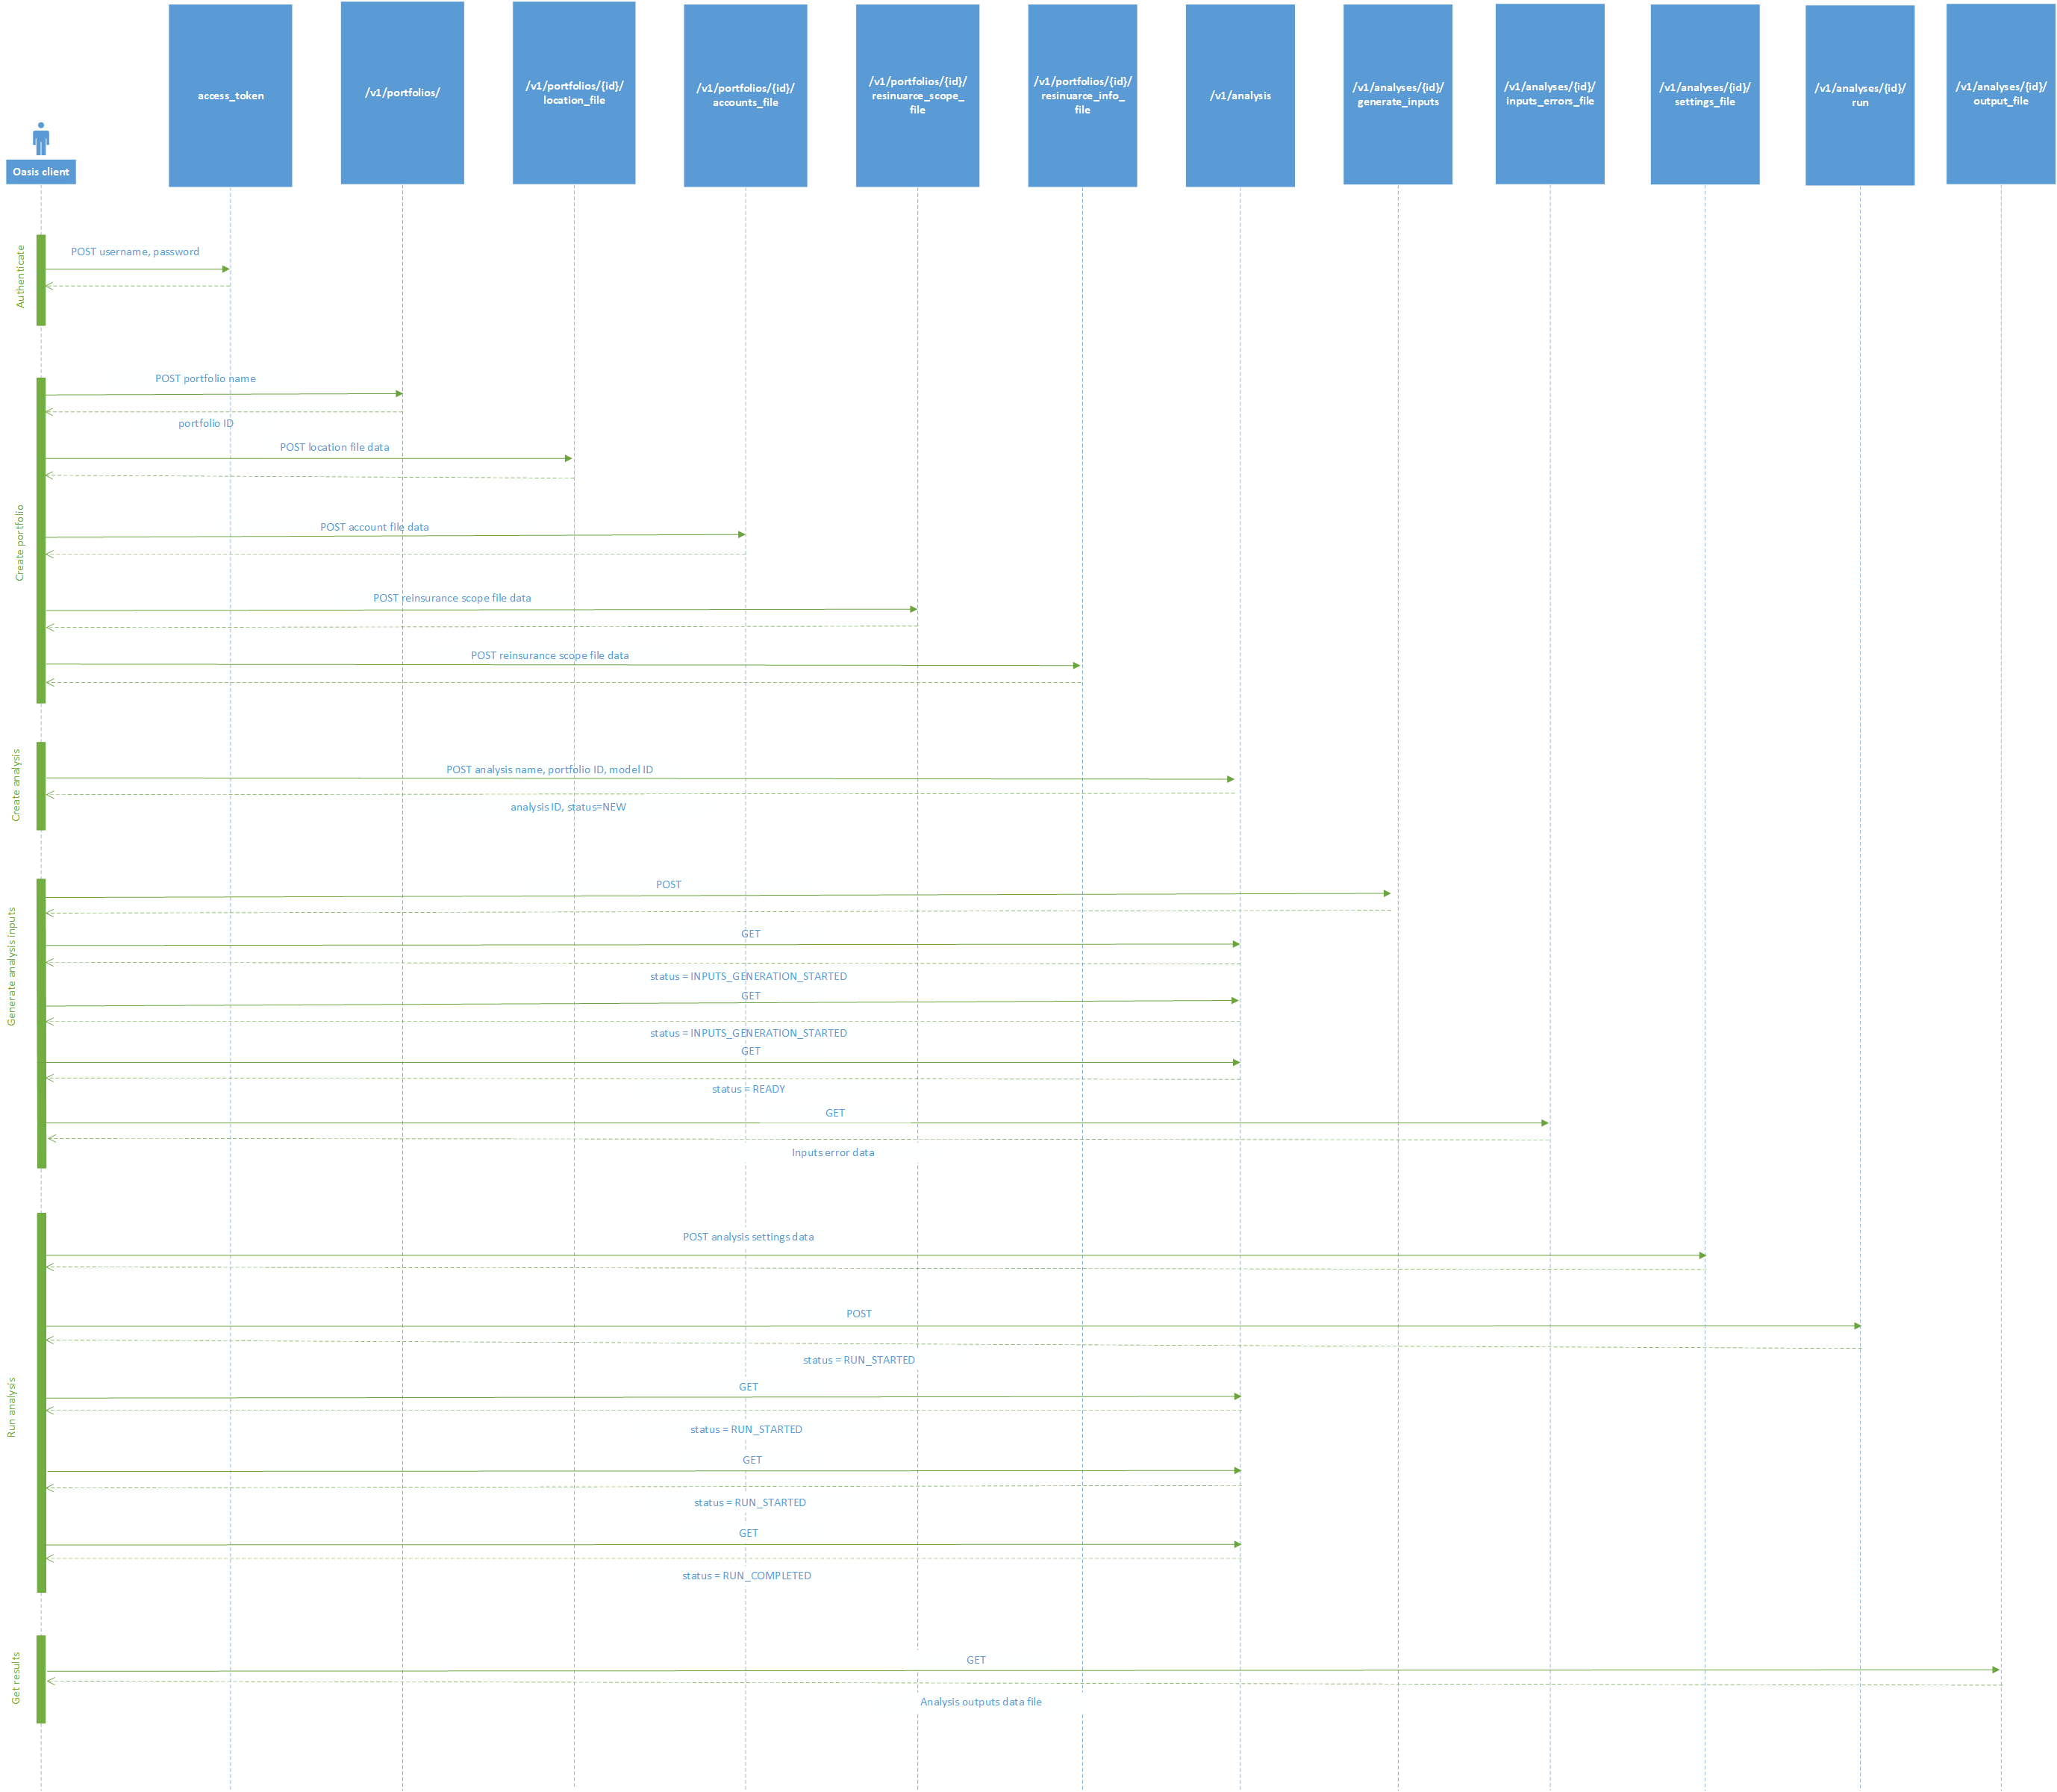 Oasis API sequence